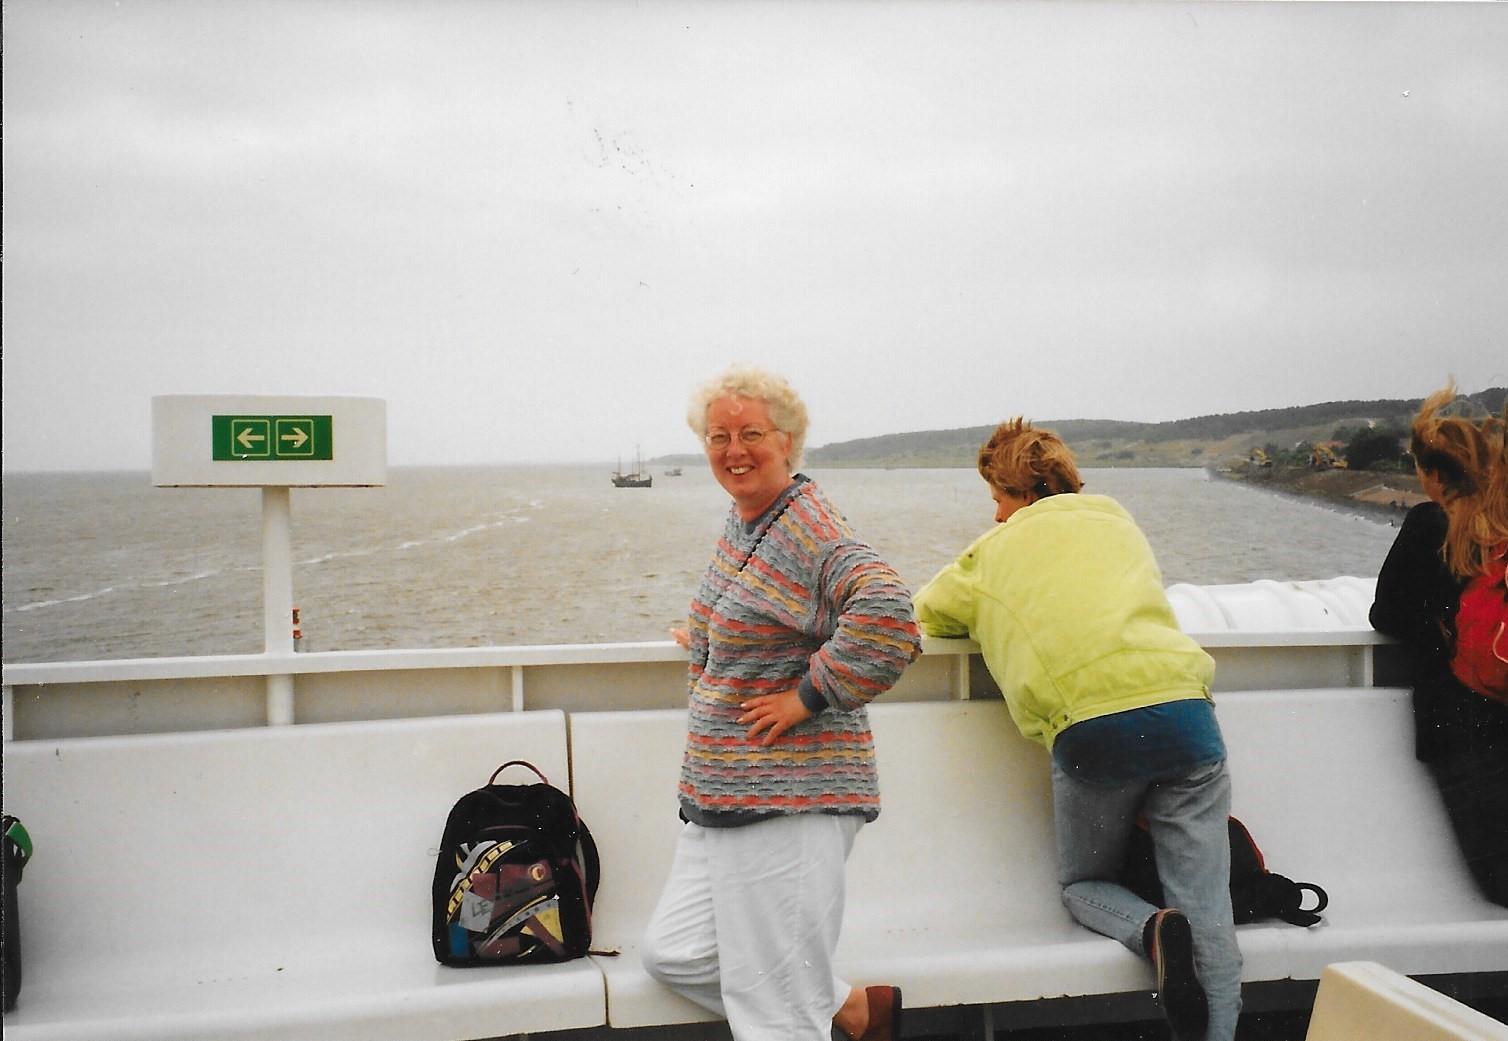 Vlieland ferry